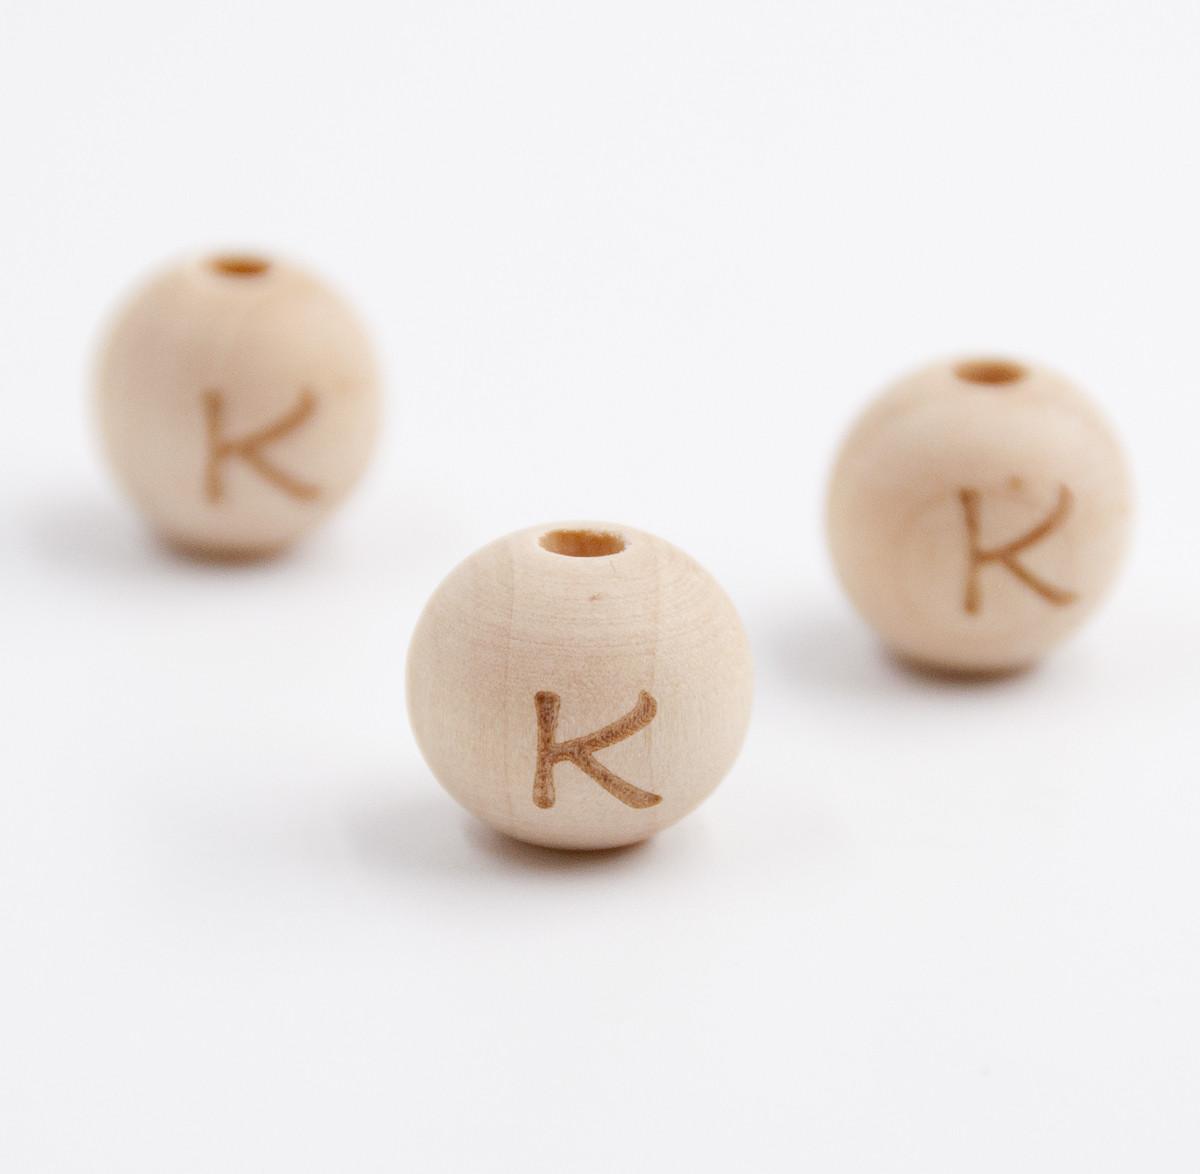 "Деревянная бусина ""Буква K"" для слингобус и грызунков, 14 мм, клён"